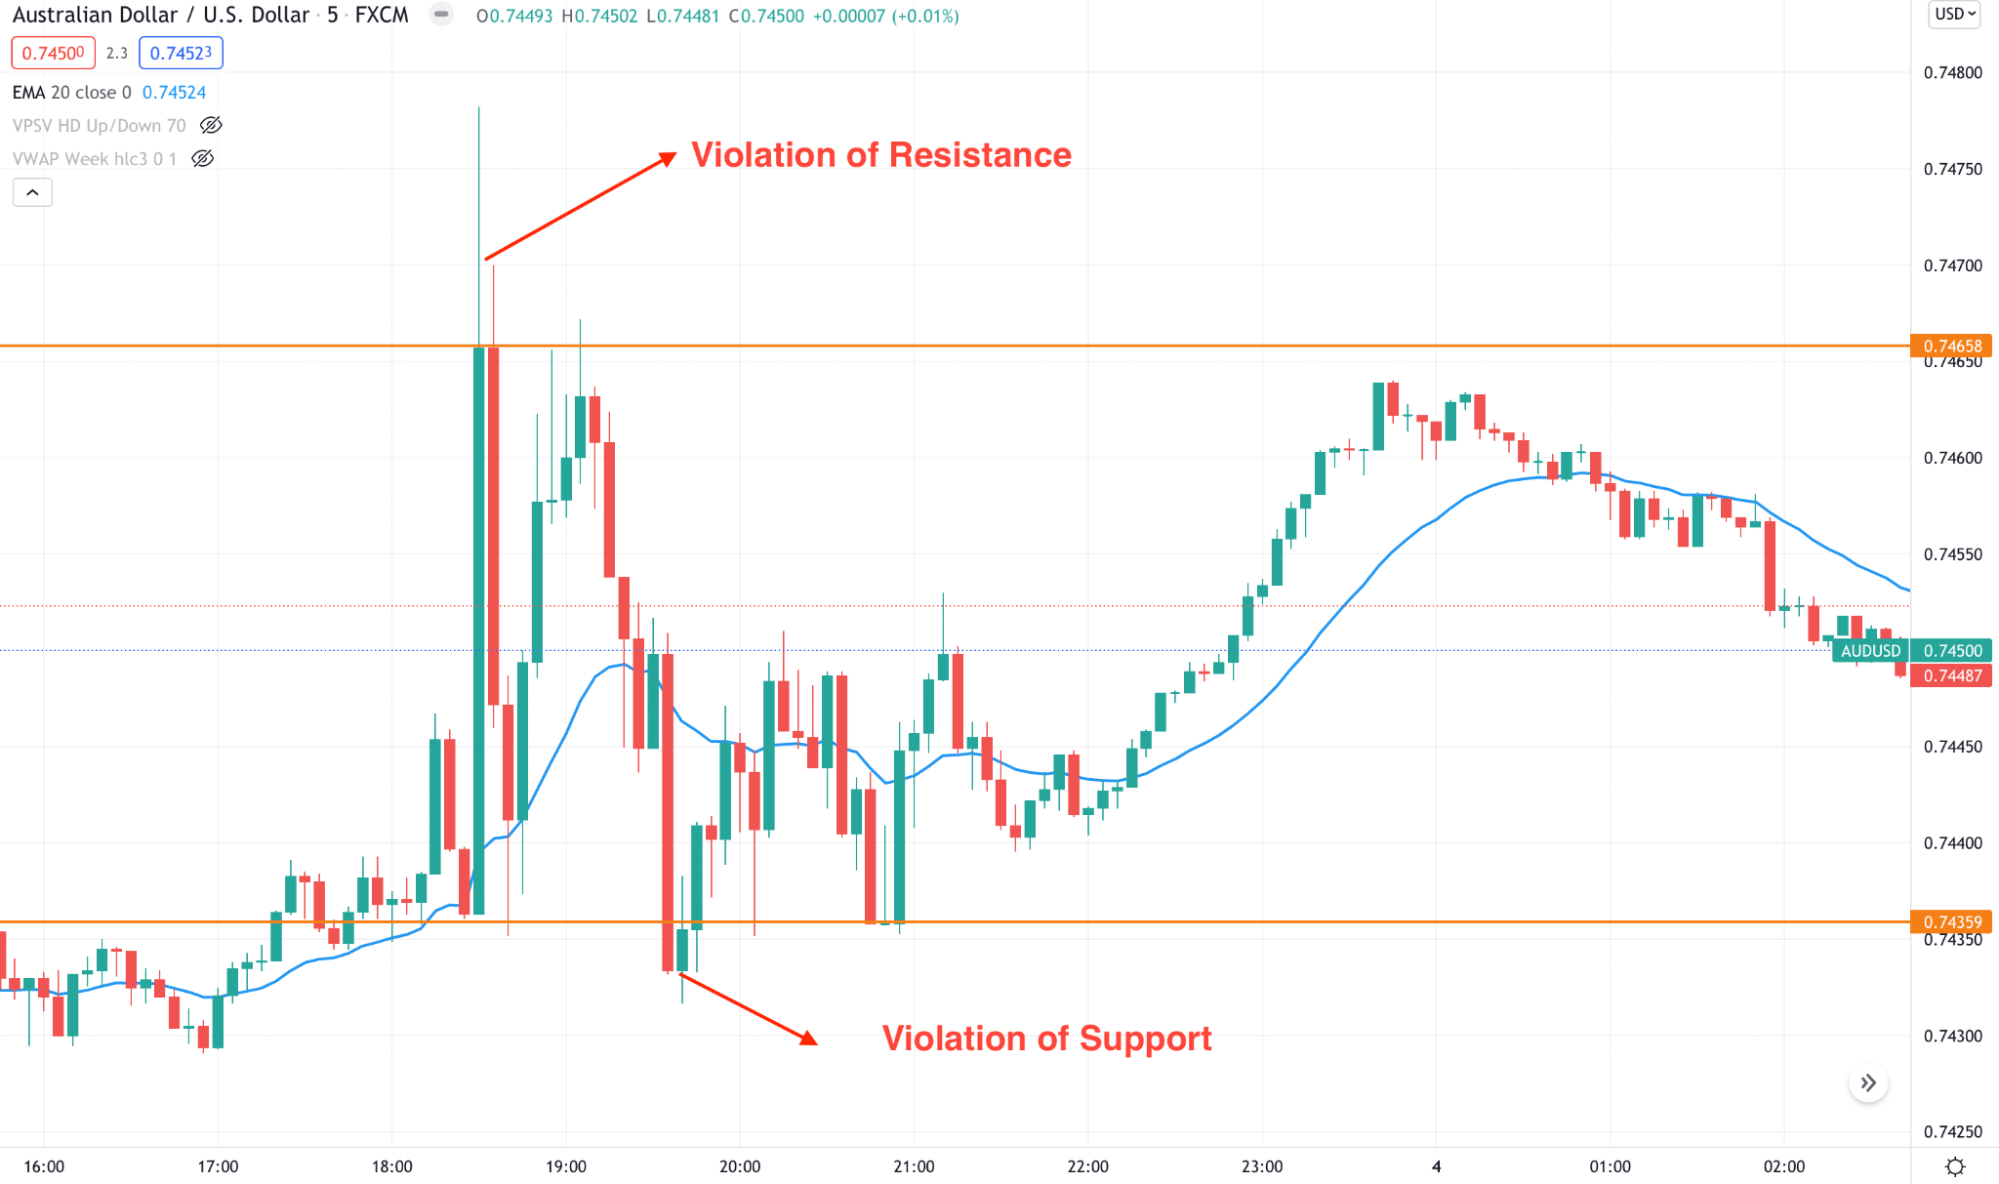 AUD/USD 5m chart